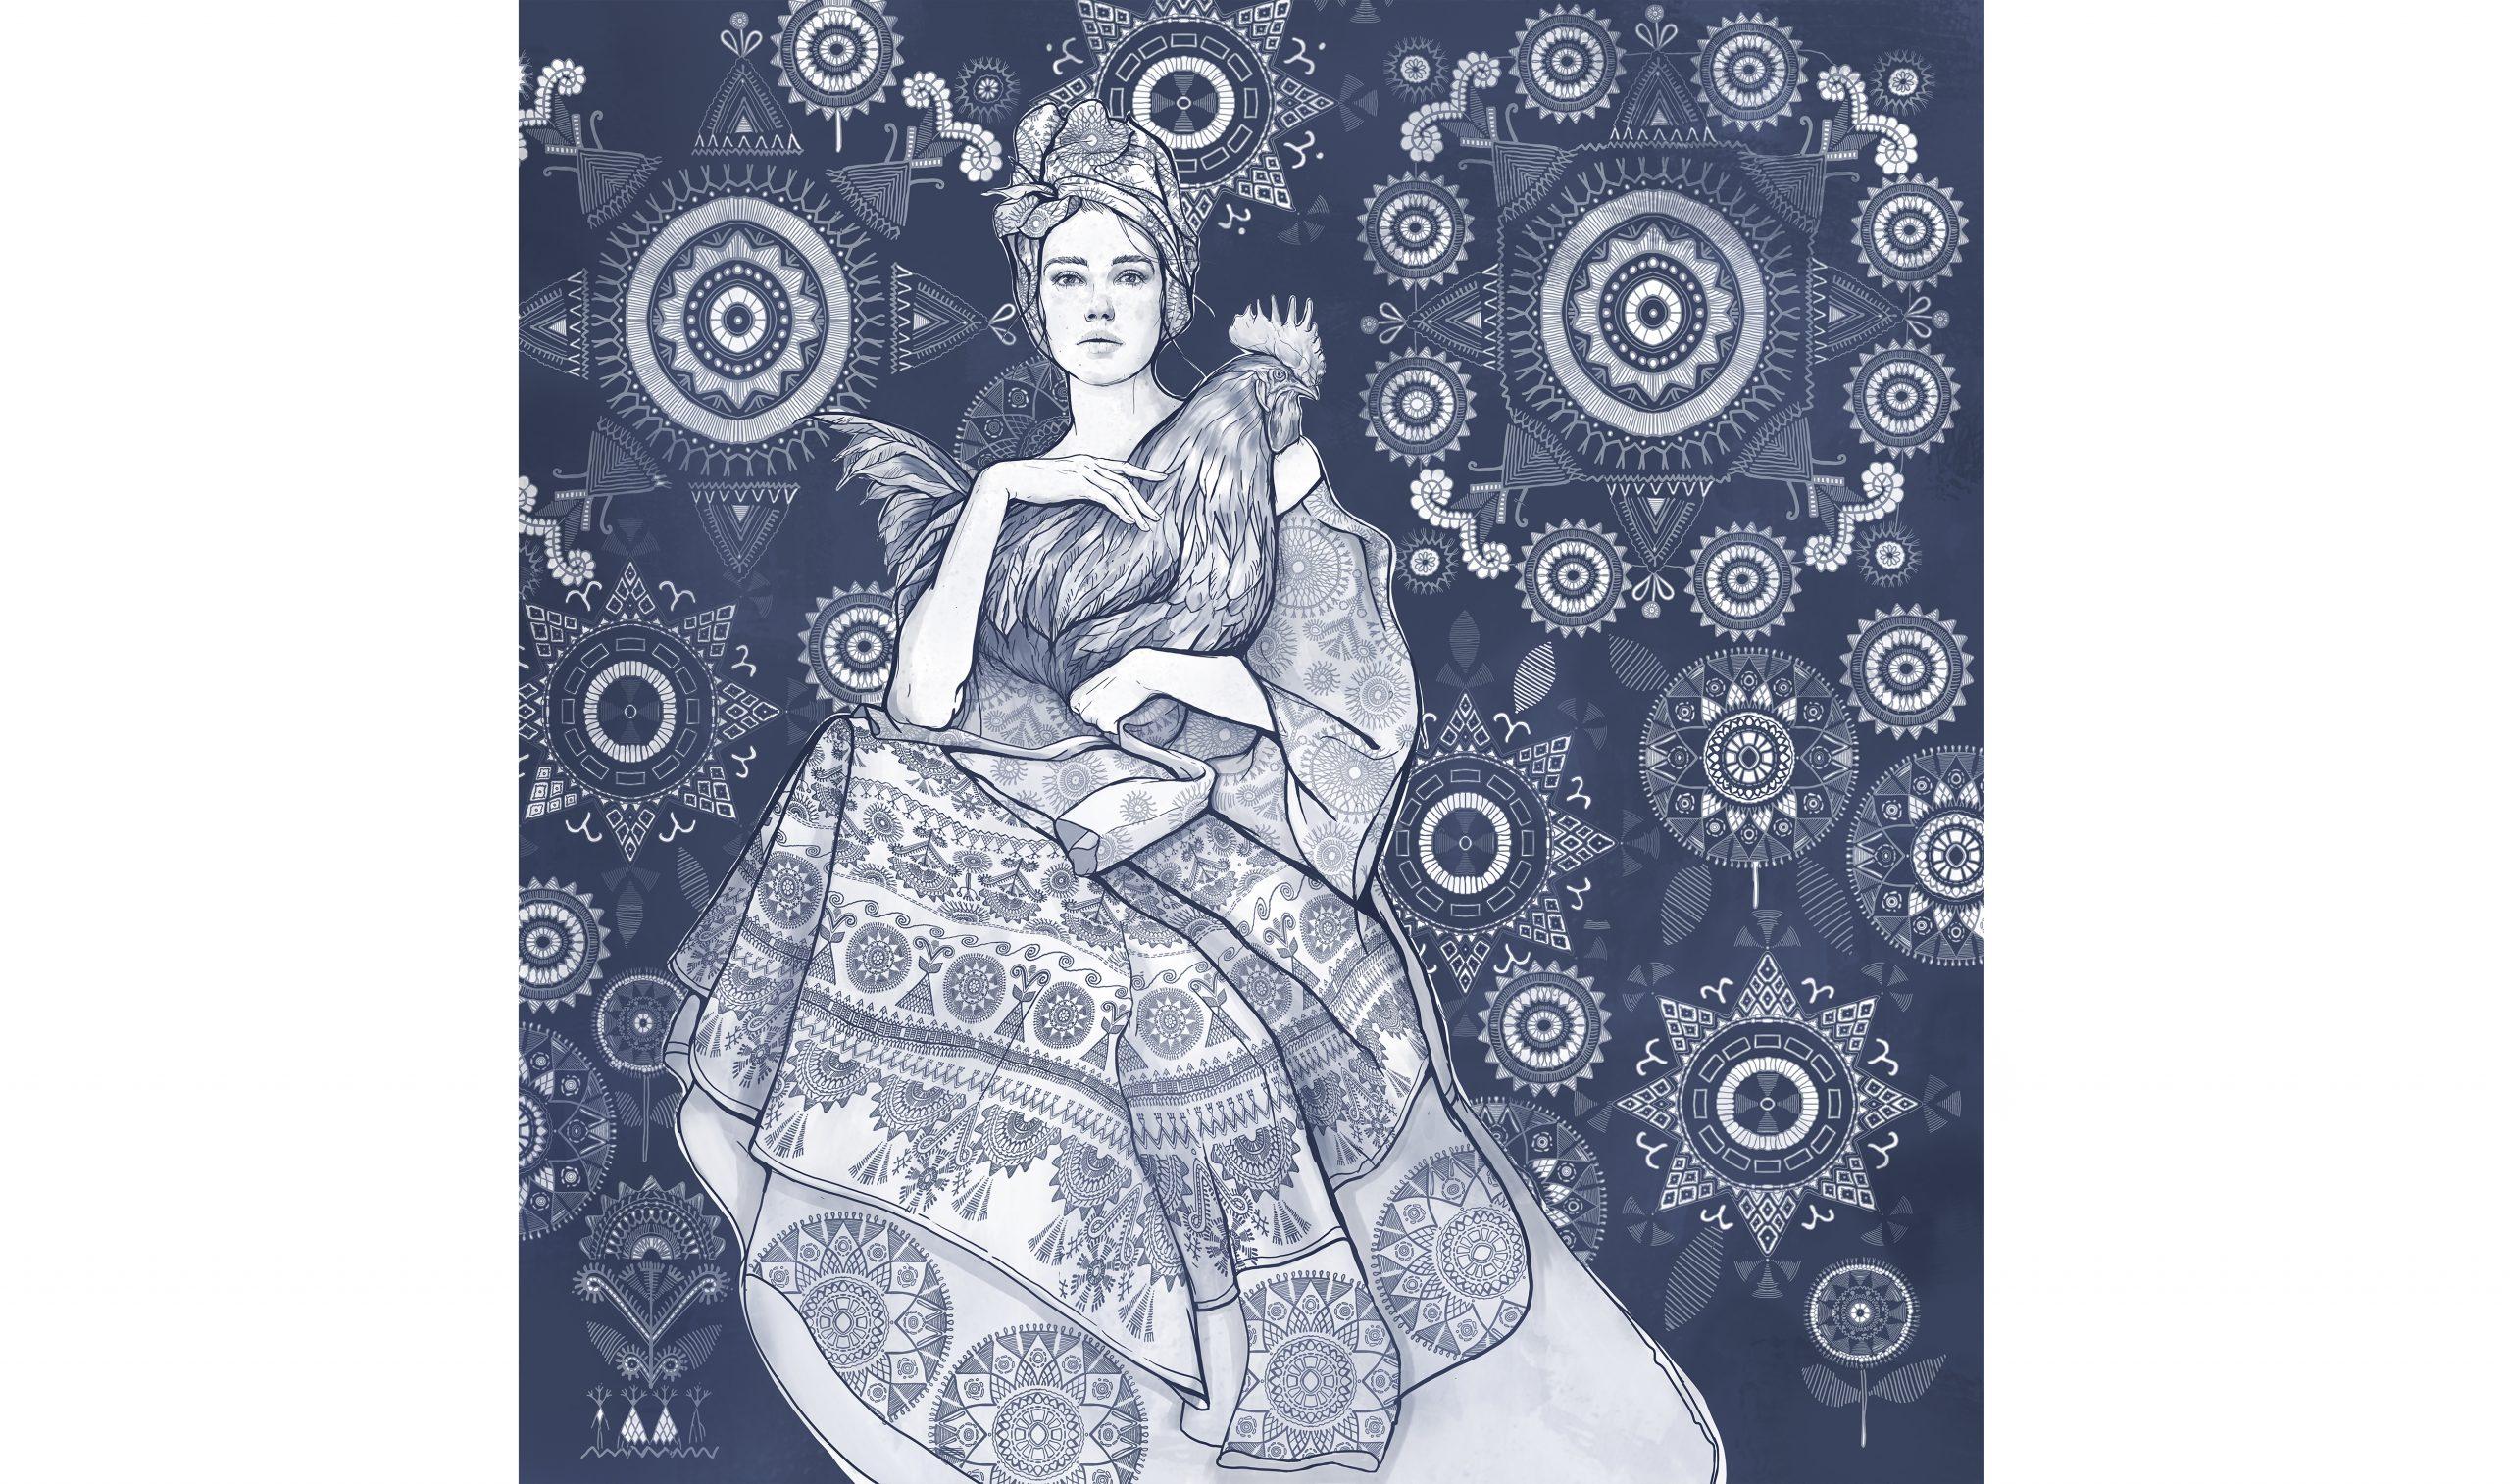 Poster mockup illustration